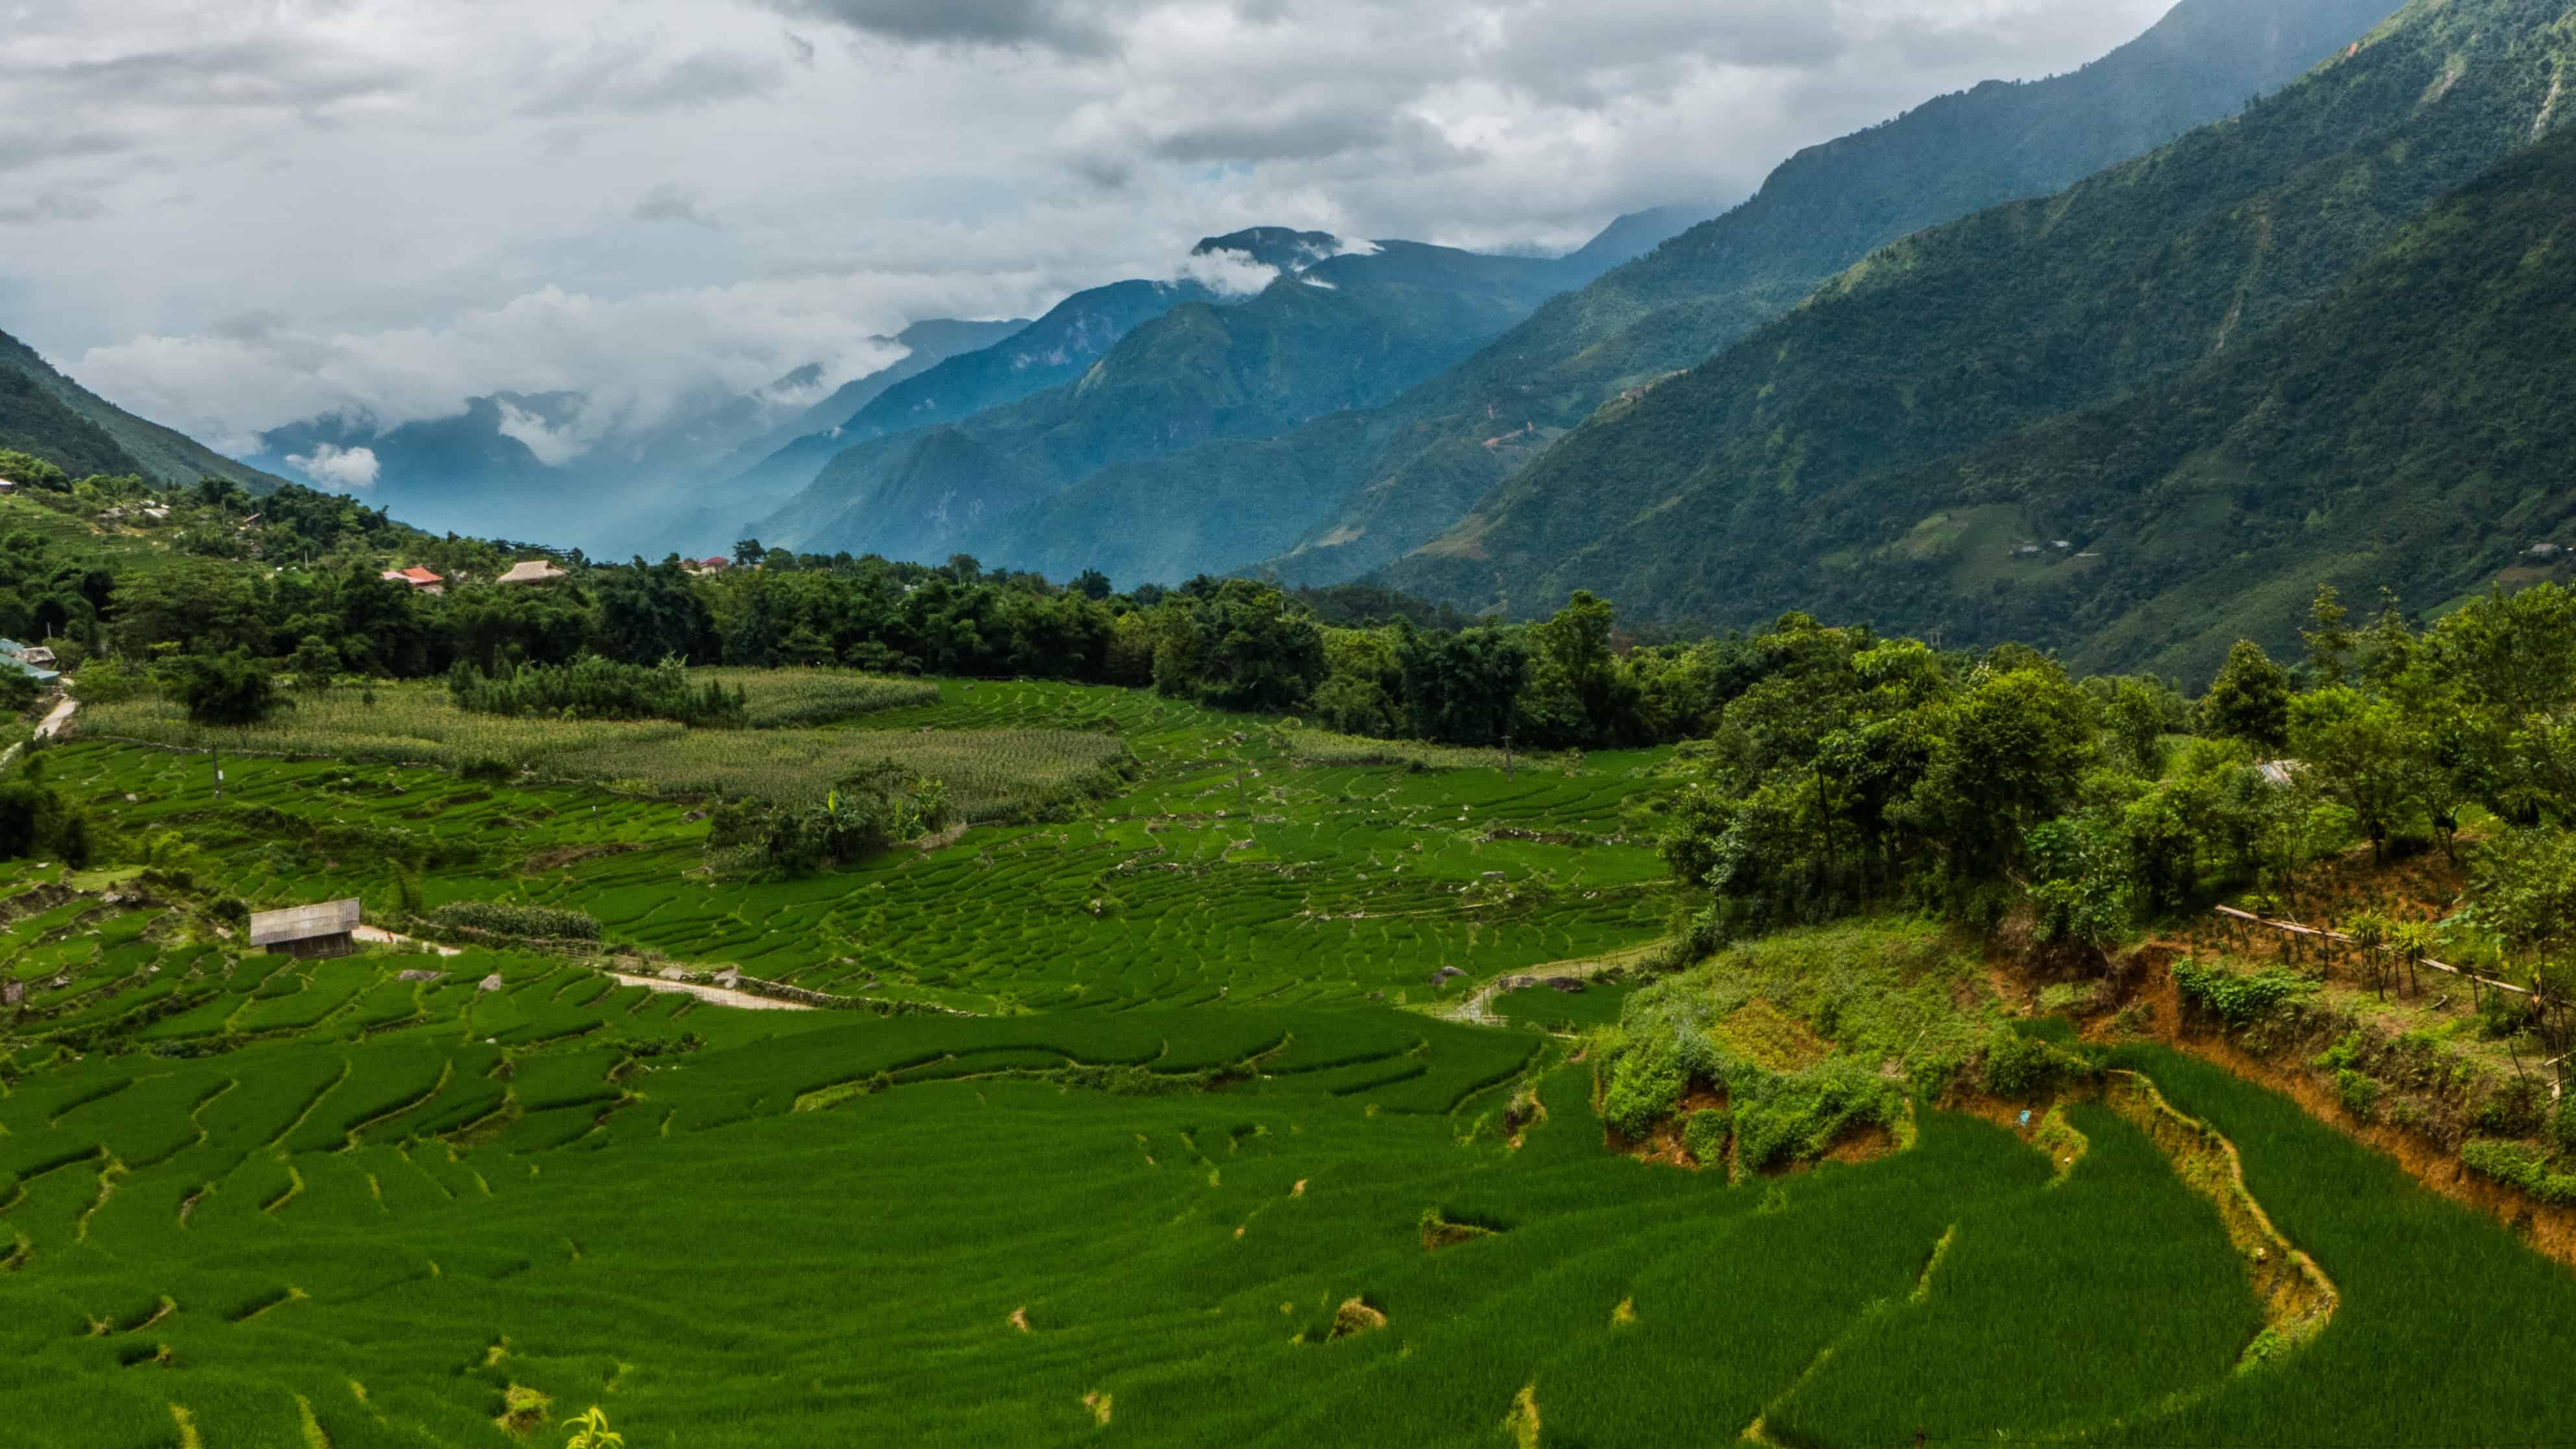 Hau Thao; Sapa; tarasy ryżowe